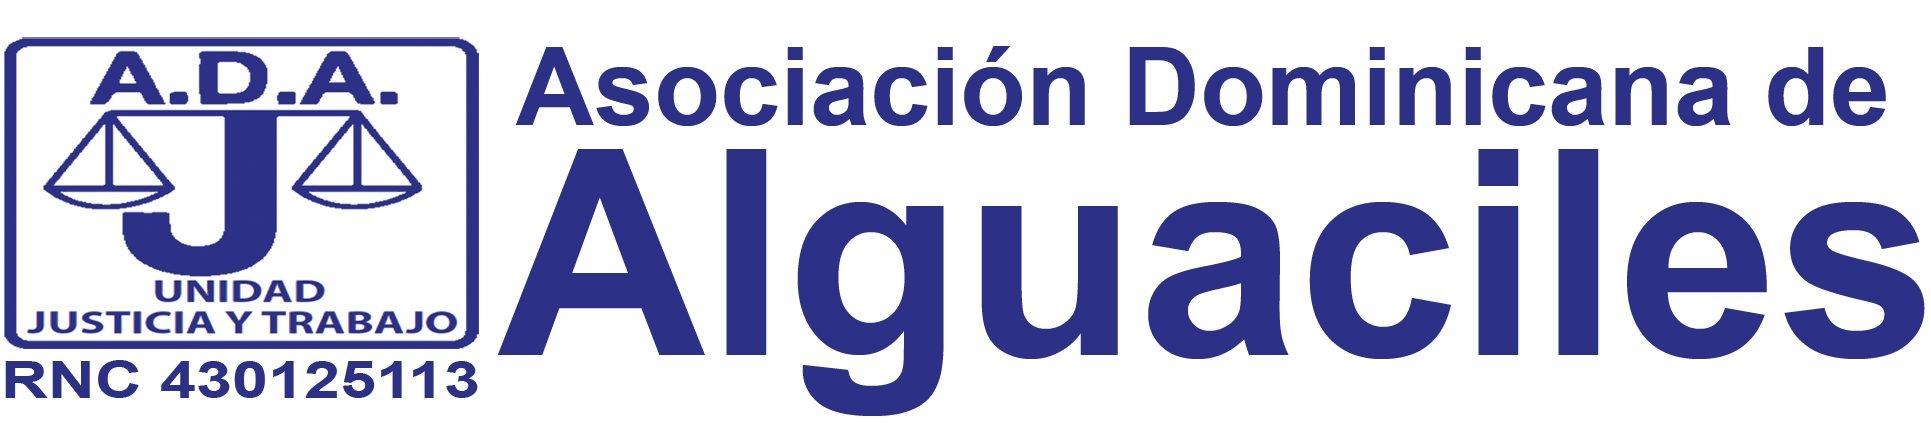 Asociación Dominicana de Centros Comerciales en marzo